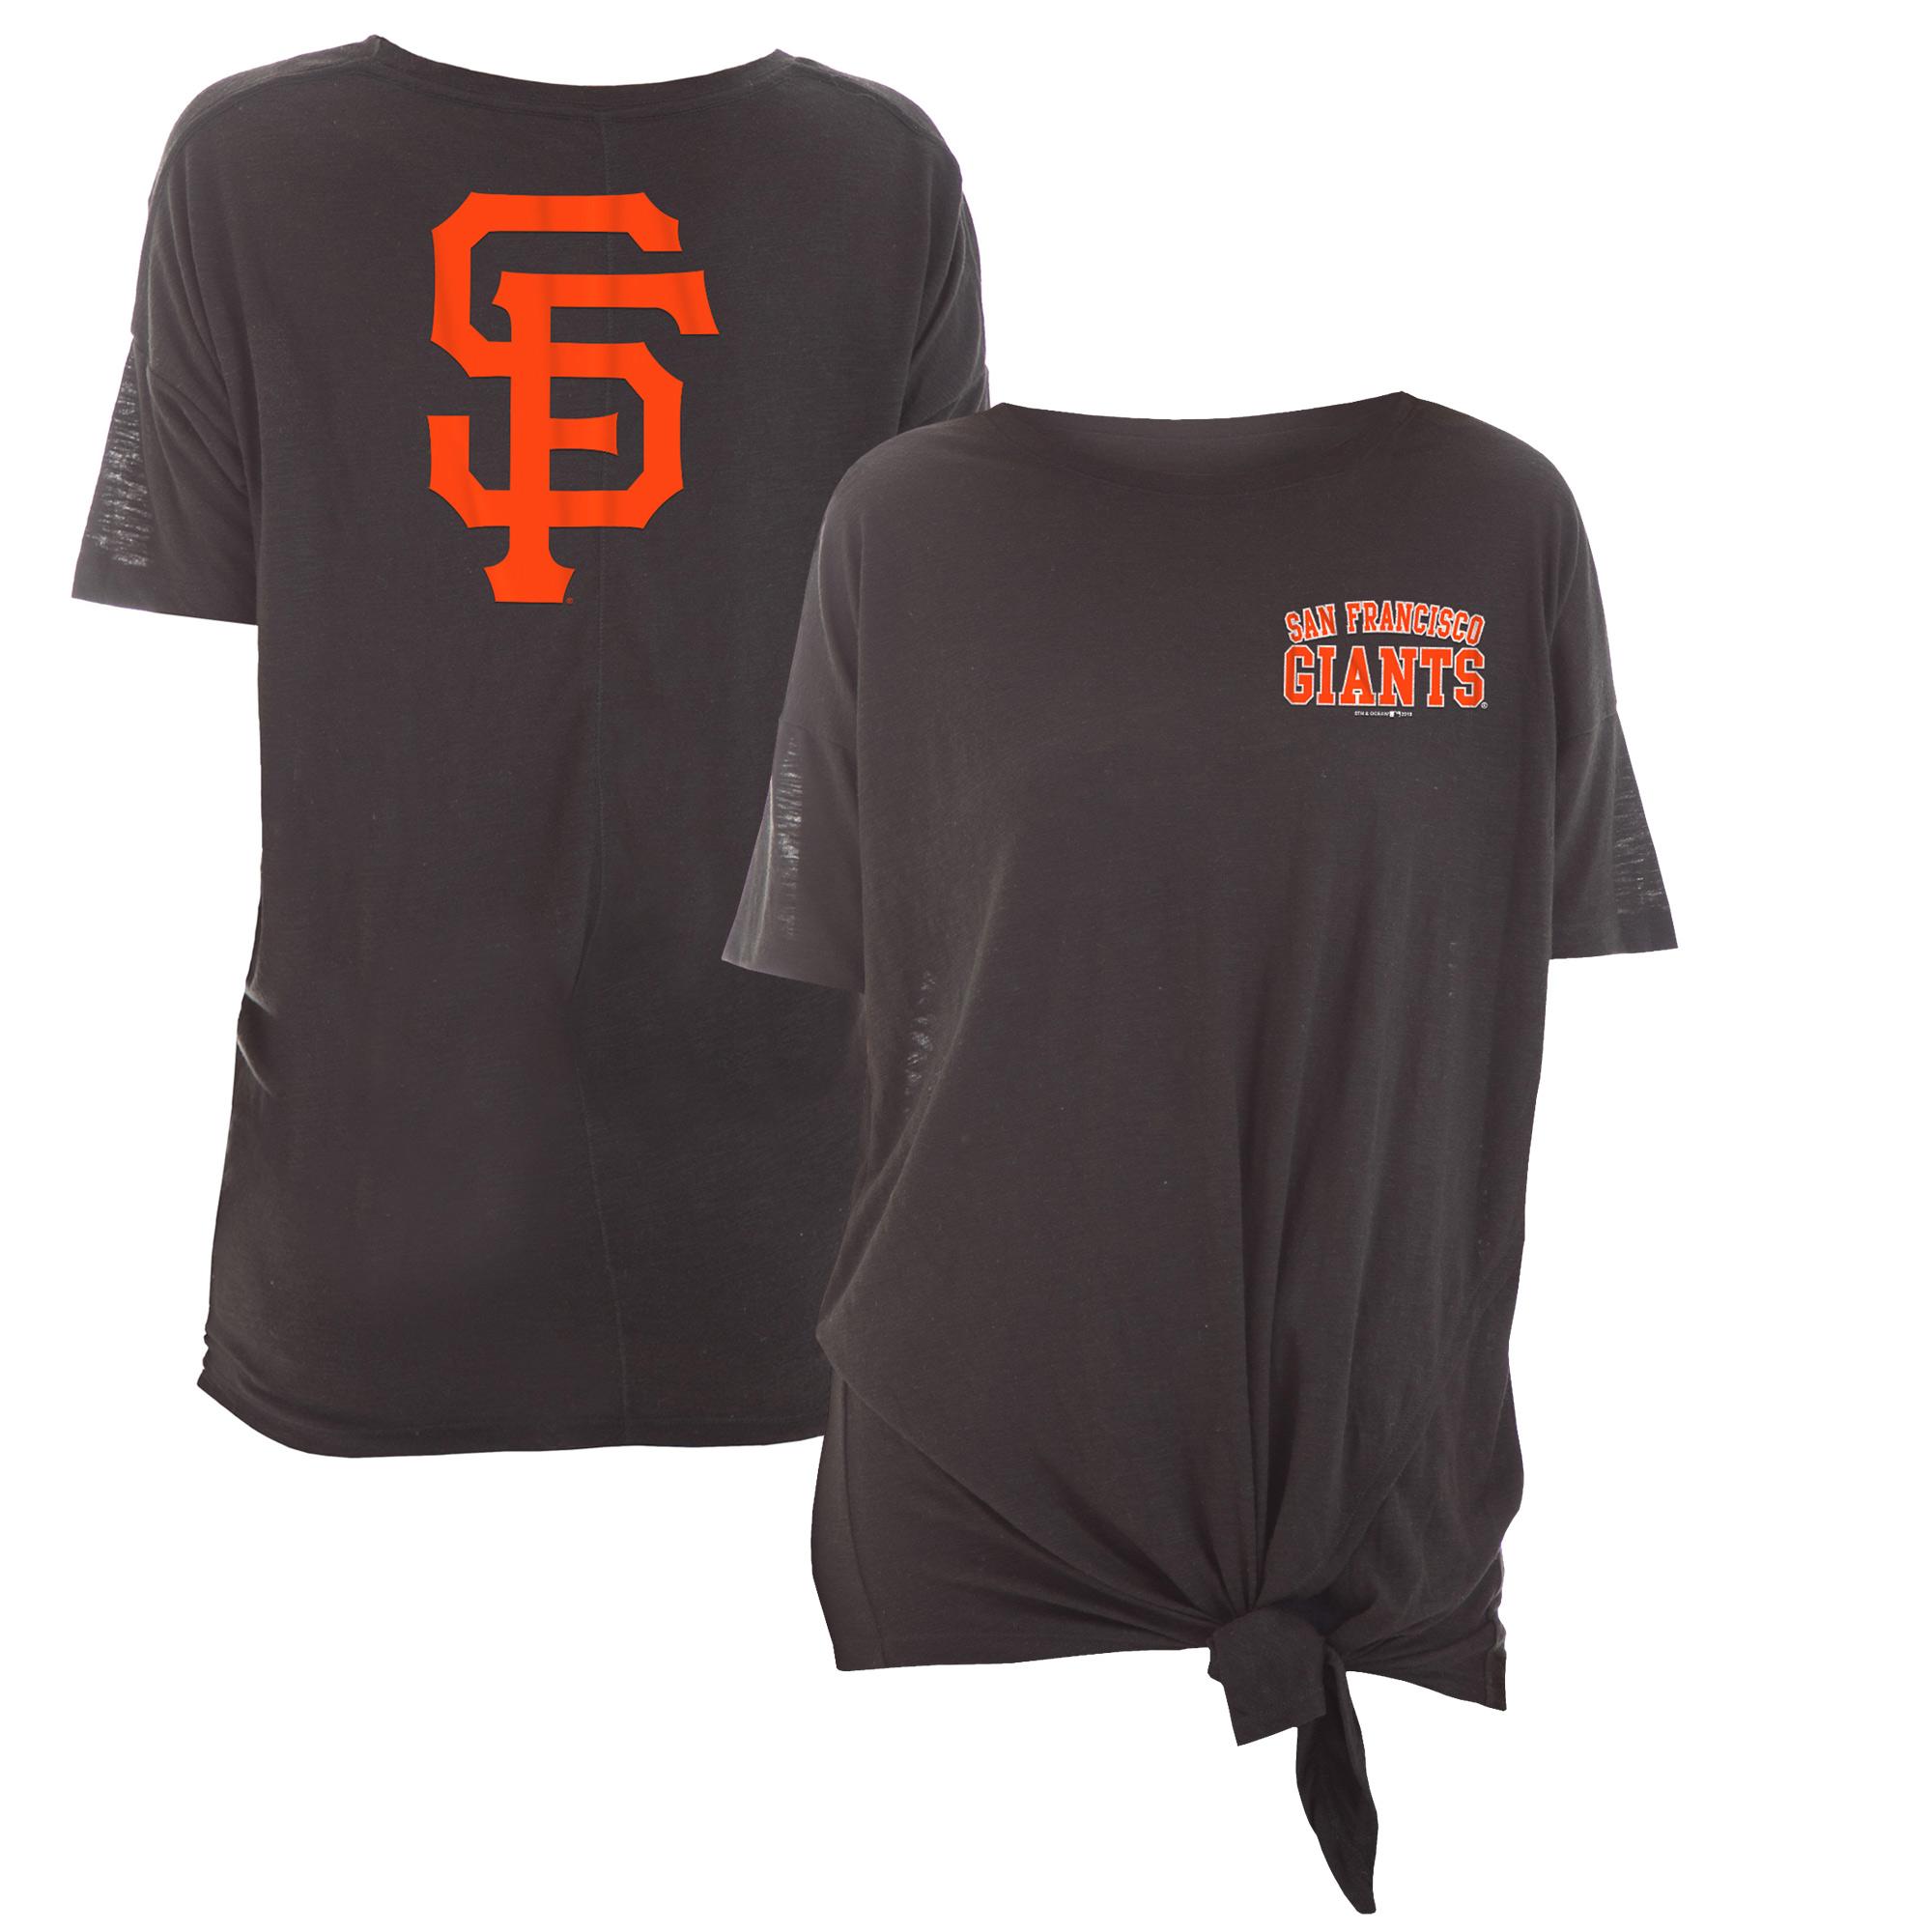 San Francisco Giants New Era Women's Scoop Neck Side Tie T-Shirt - Black